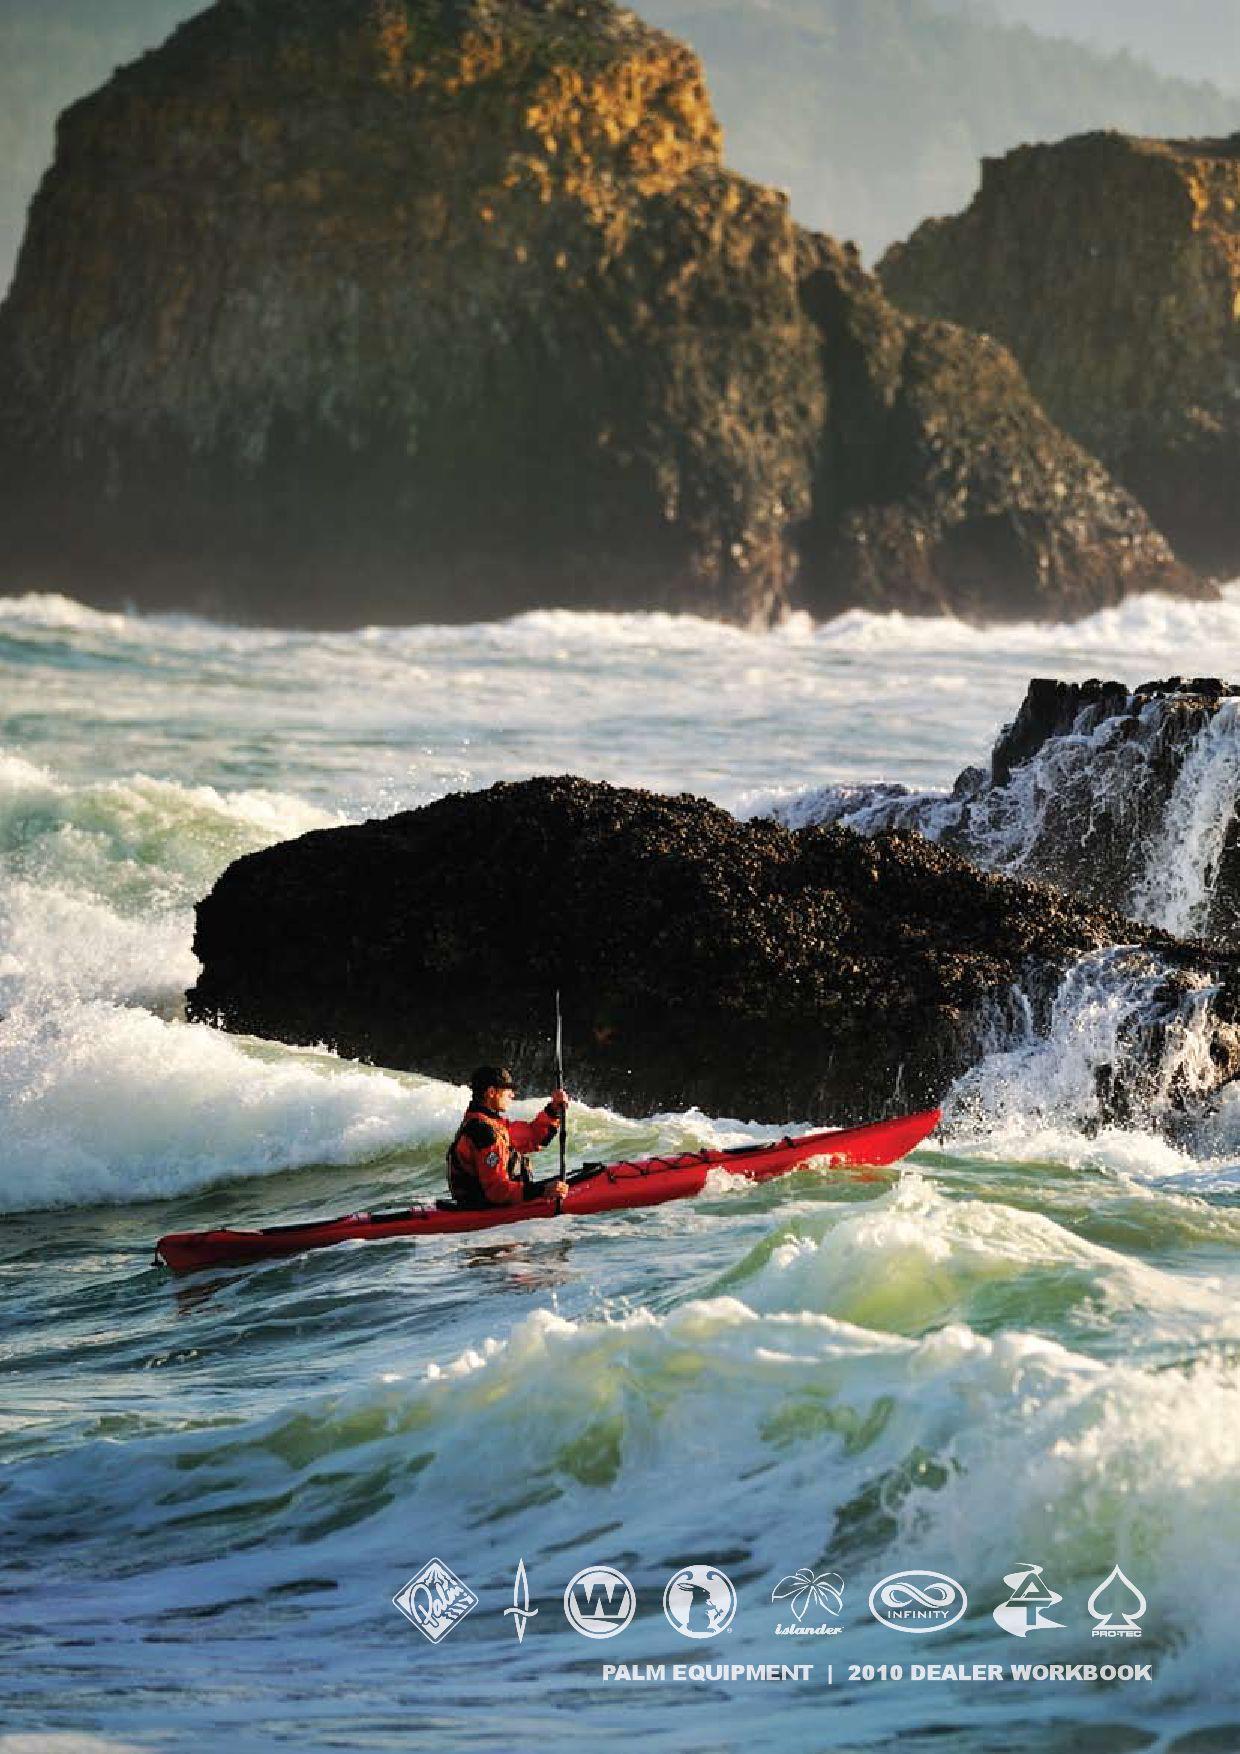 Float Bag for Canoes Harmony Gear 3D End Canoe Flotation Bag Gold Single End Floatation Bag Universal Fit